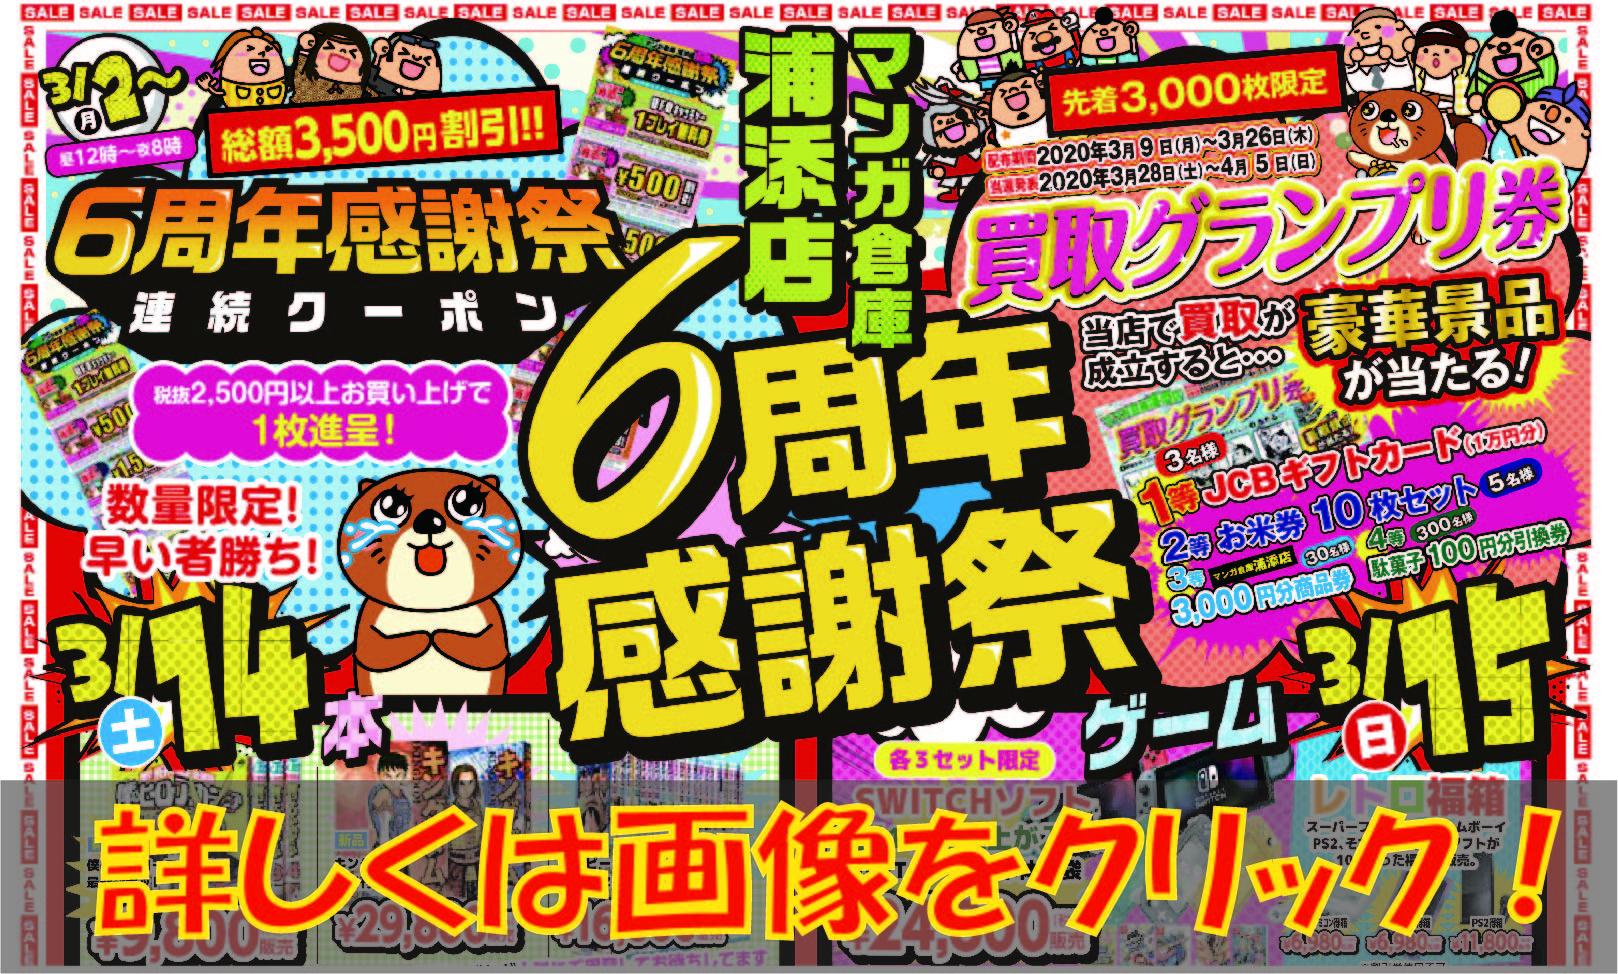 マンガ倉庫浦添店6周年感謝祭!開催!